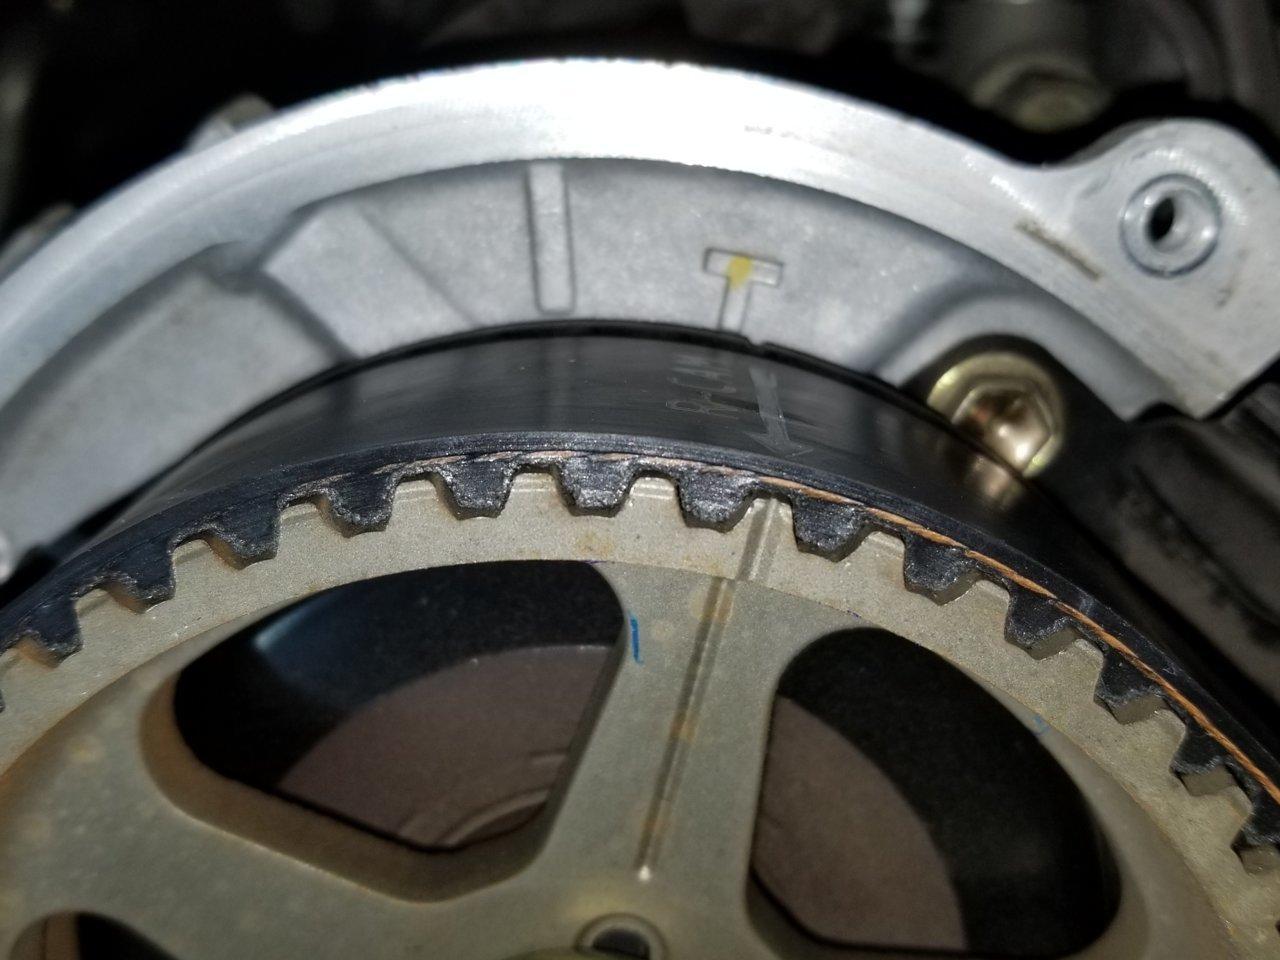 2003 Tundra 4 7 timing belt gone wrong | Toyota Tundra Forum